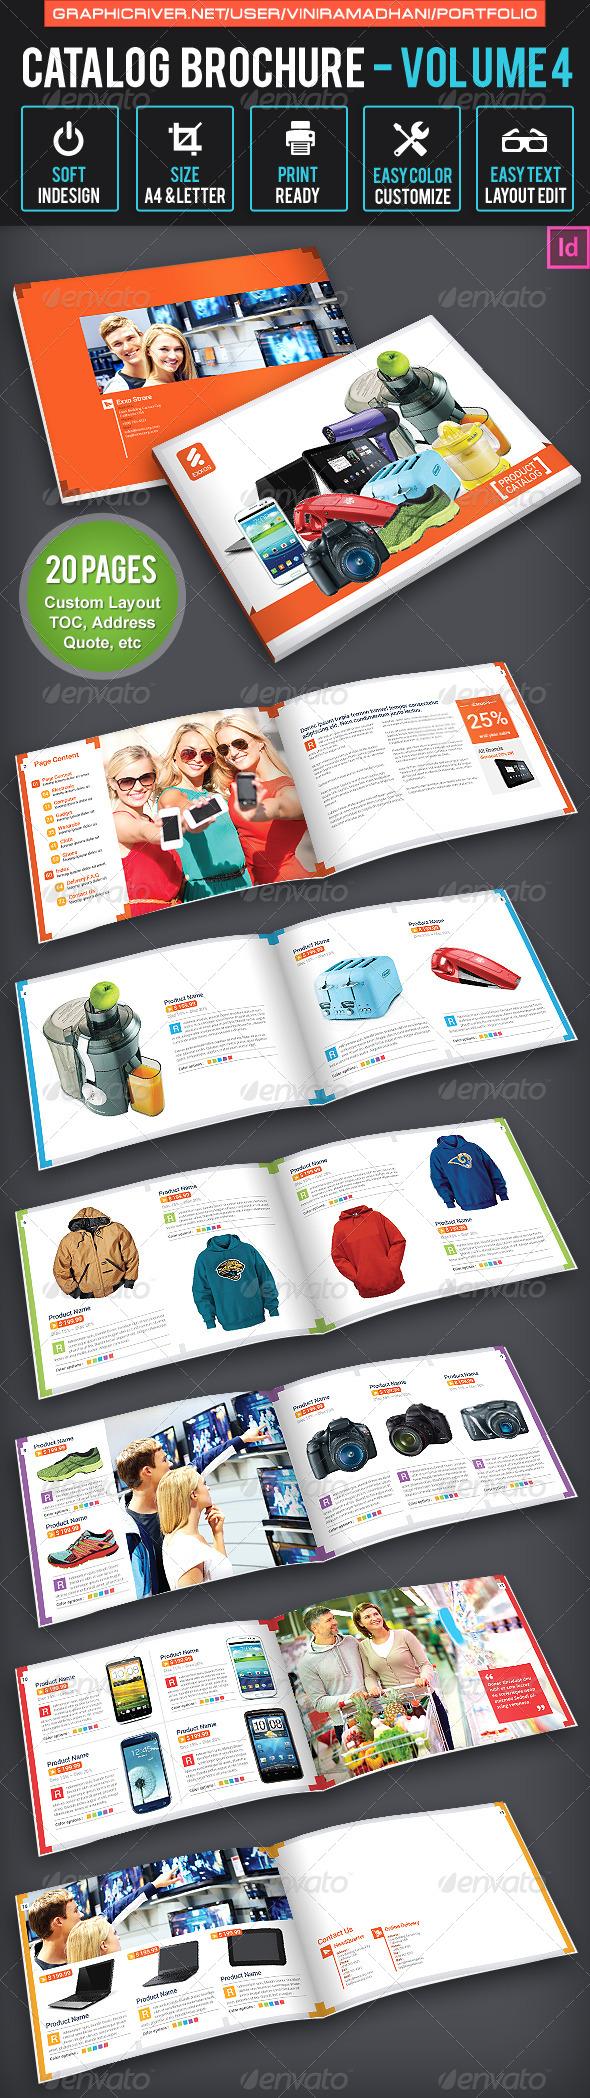 Product Catalogs Brochure | Volume 4 - Catalogs Brochures